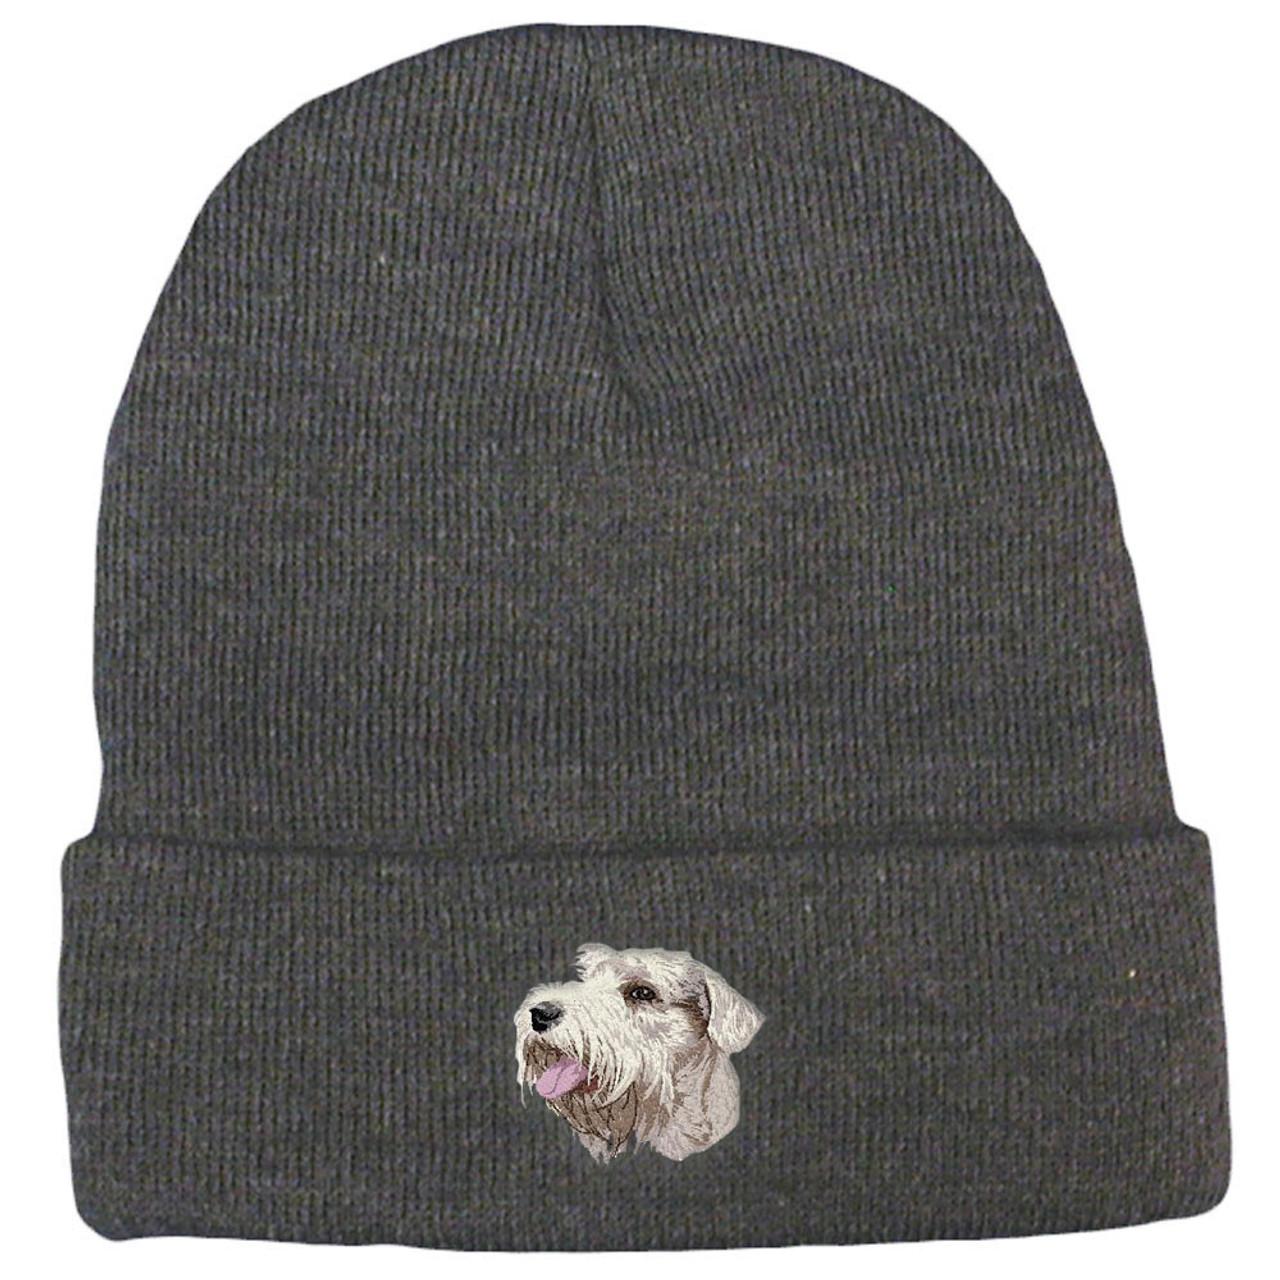 Shetland Sheepdog Custom Personalized Embroidery Embroidered Beanie